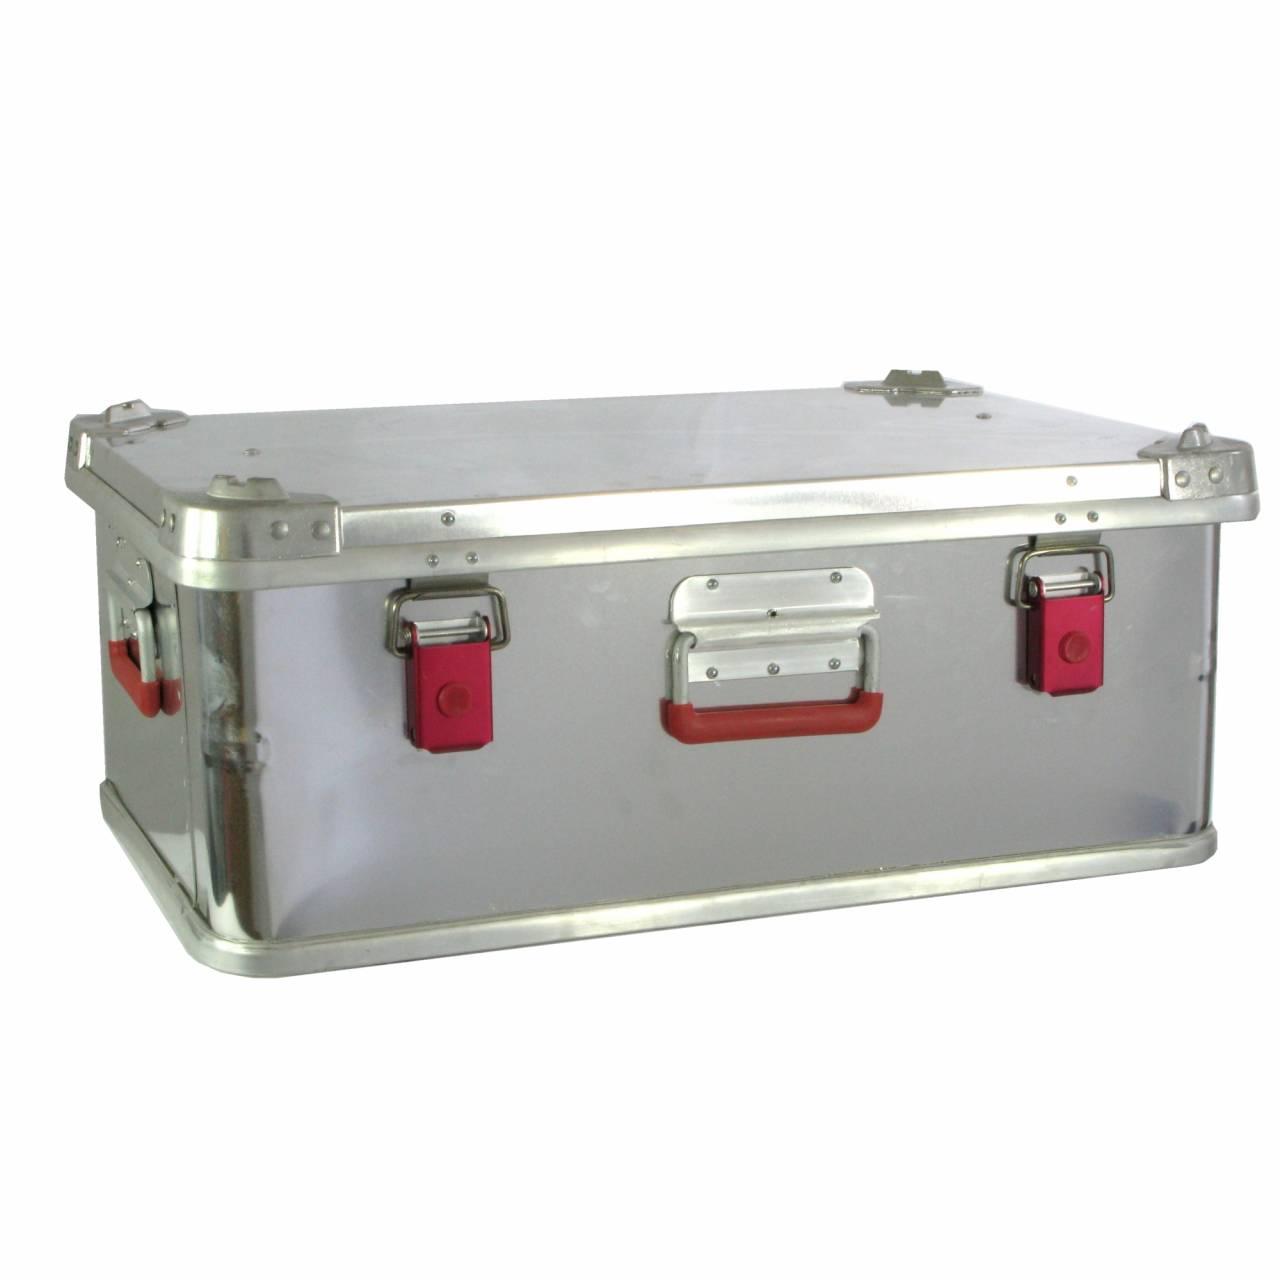 Alu-Werkzeugbox Gr.1, 580 x 384 x 240 mm